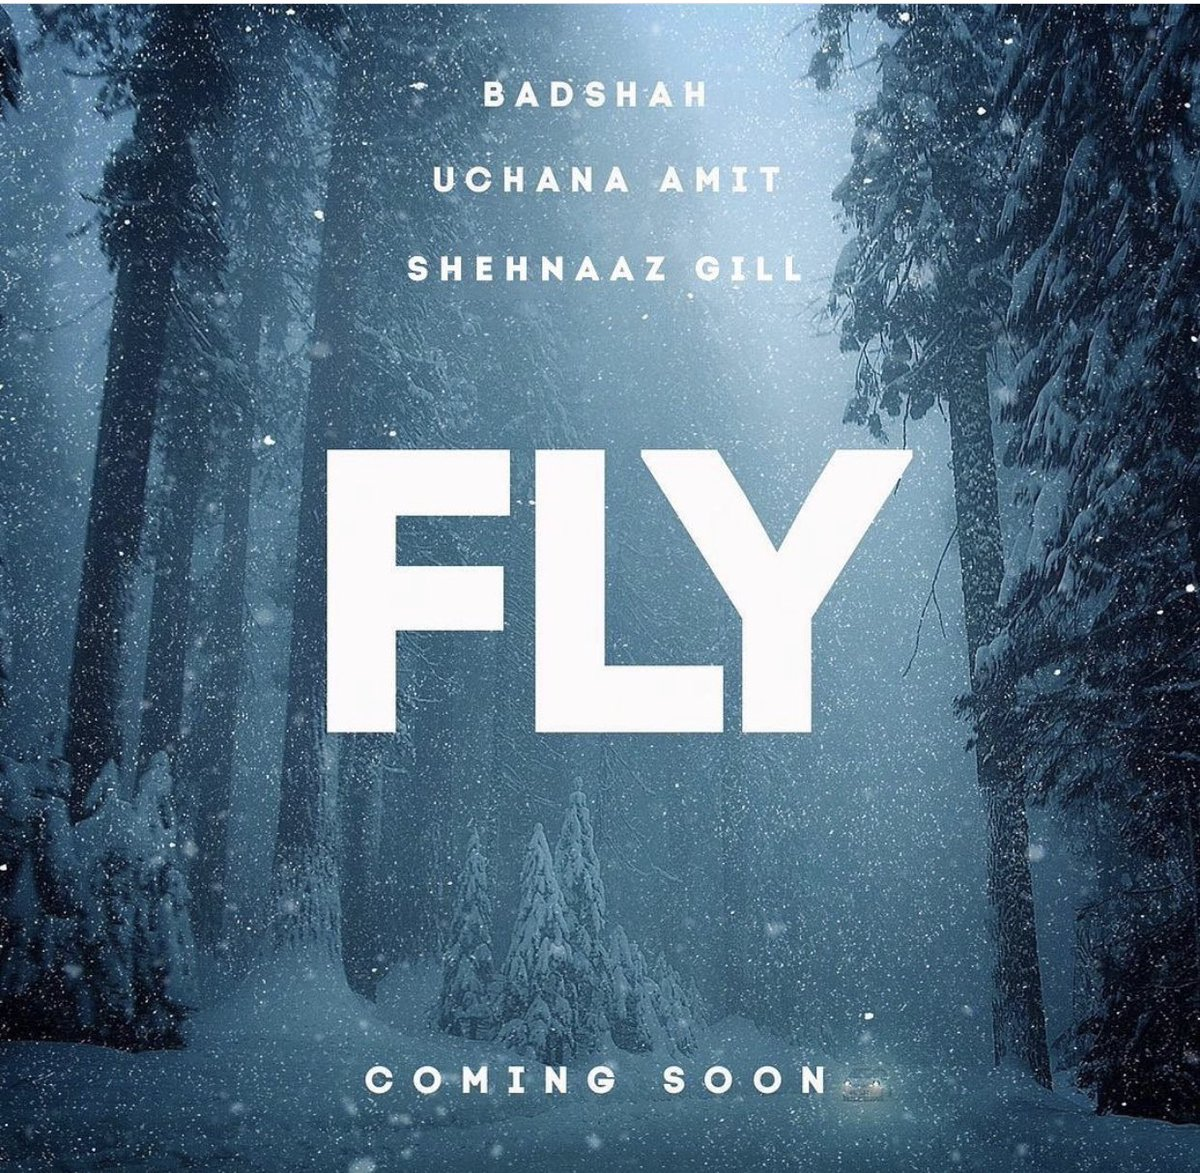 RT @ishehnaaz_gill: Coming Soon ❤️❤️❤️ FLY❤️❤️❤️ @Its_Badshah @theuchana @sonymusicindia @sonymusic https://t.co/QOKTQywfWw